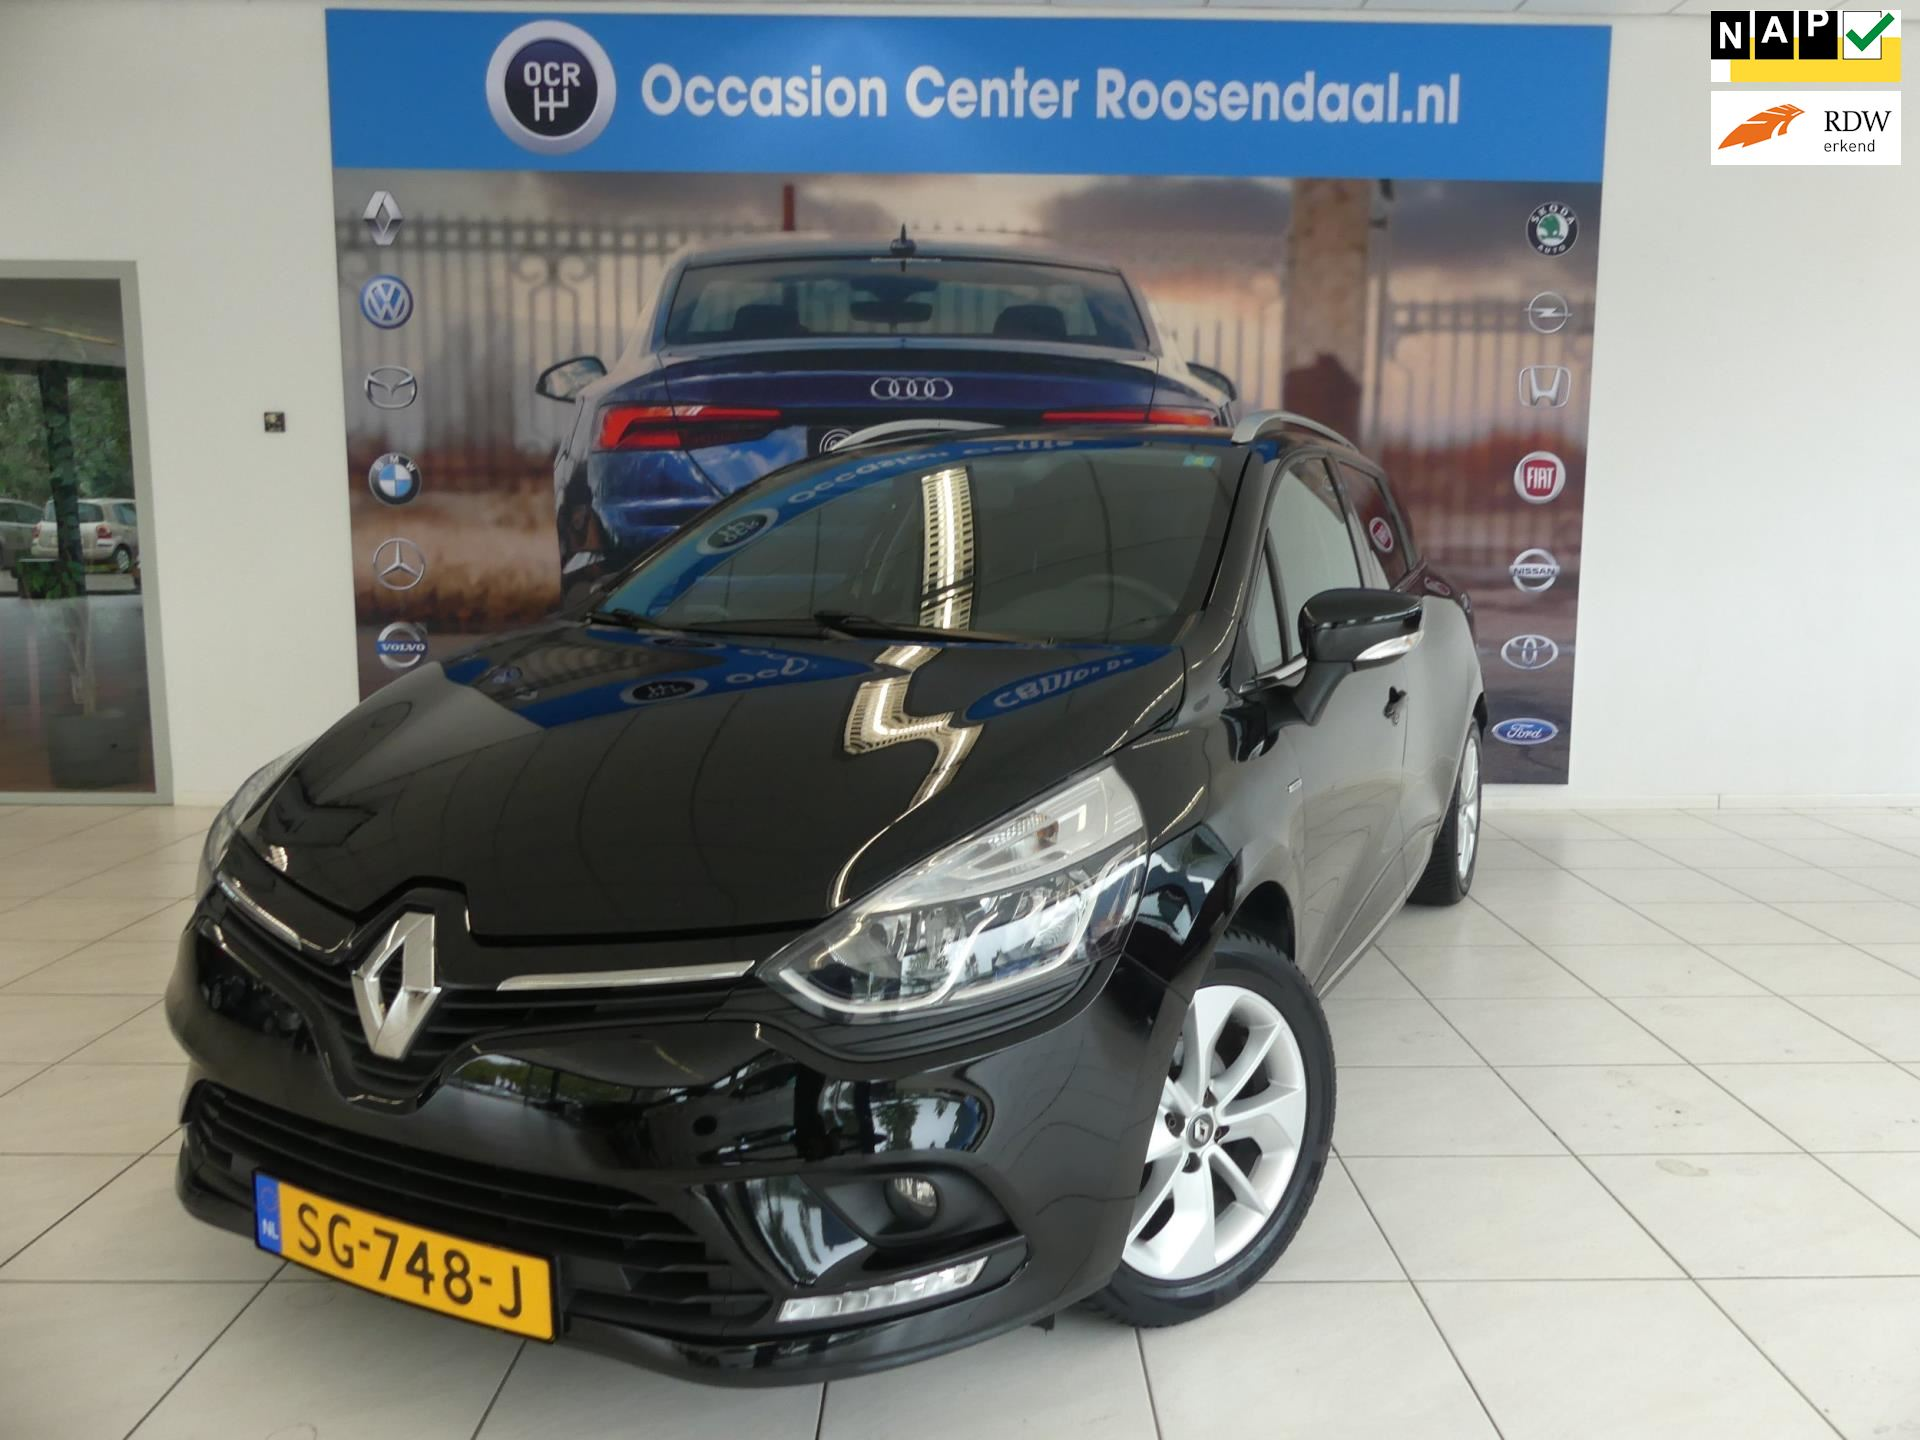 Renault Clio Estate occasion - Occasion Center Roosendaal